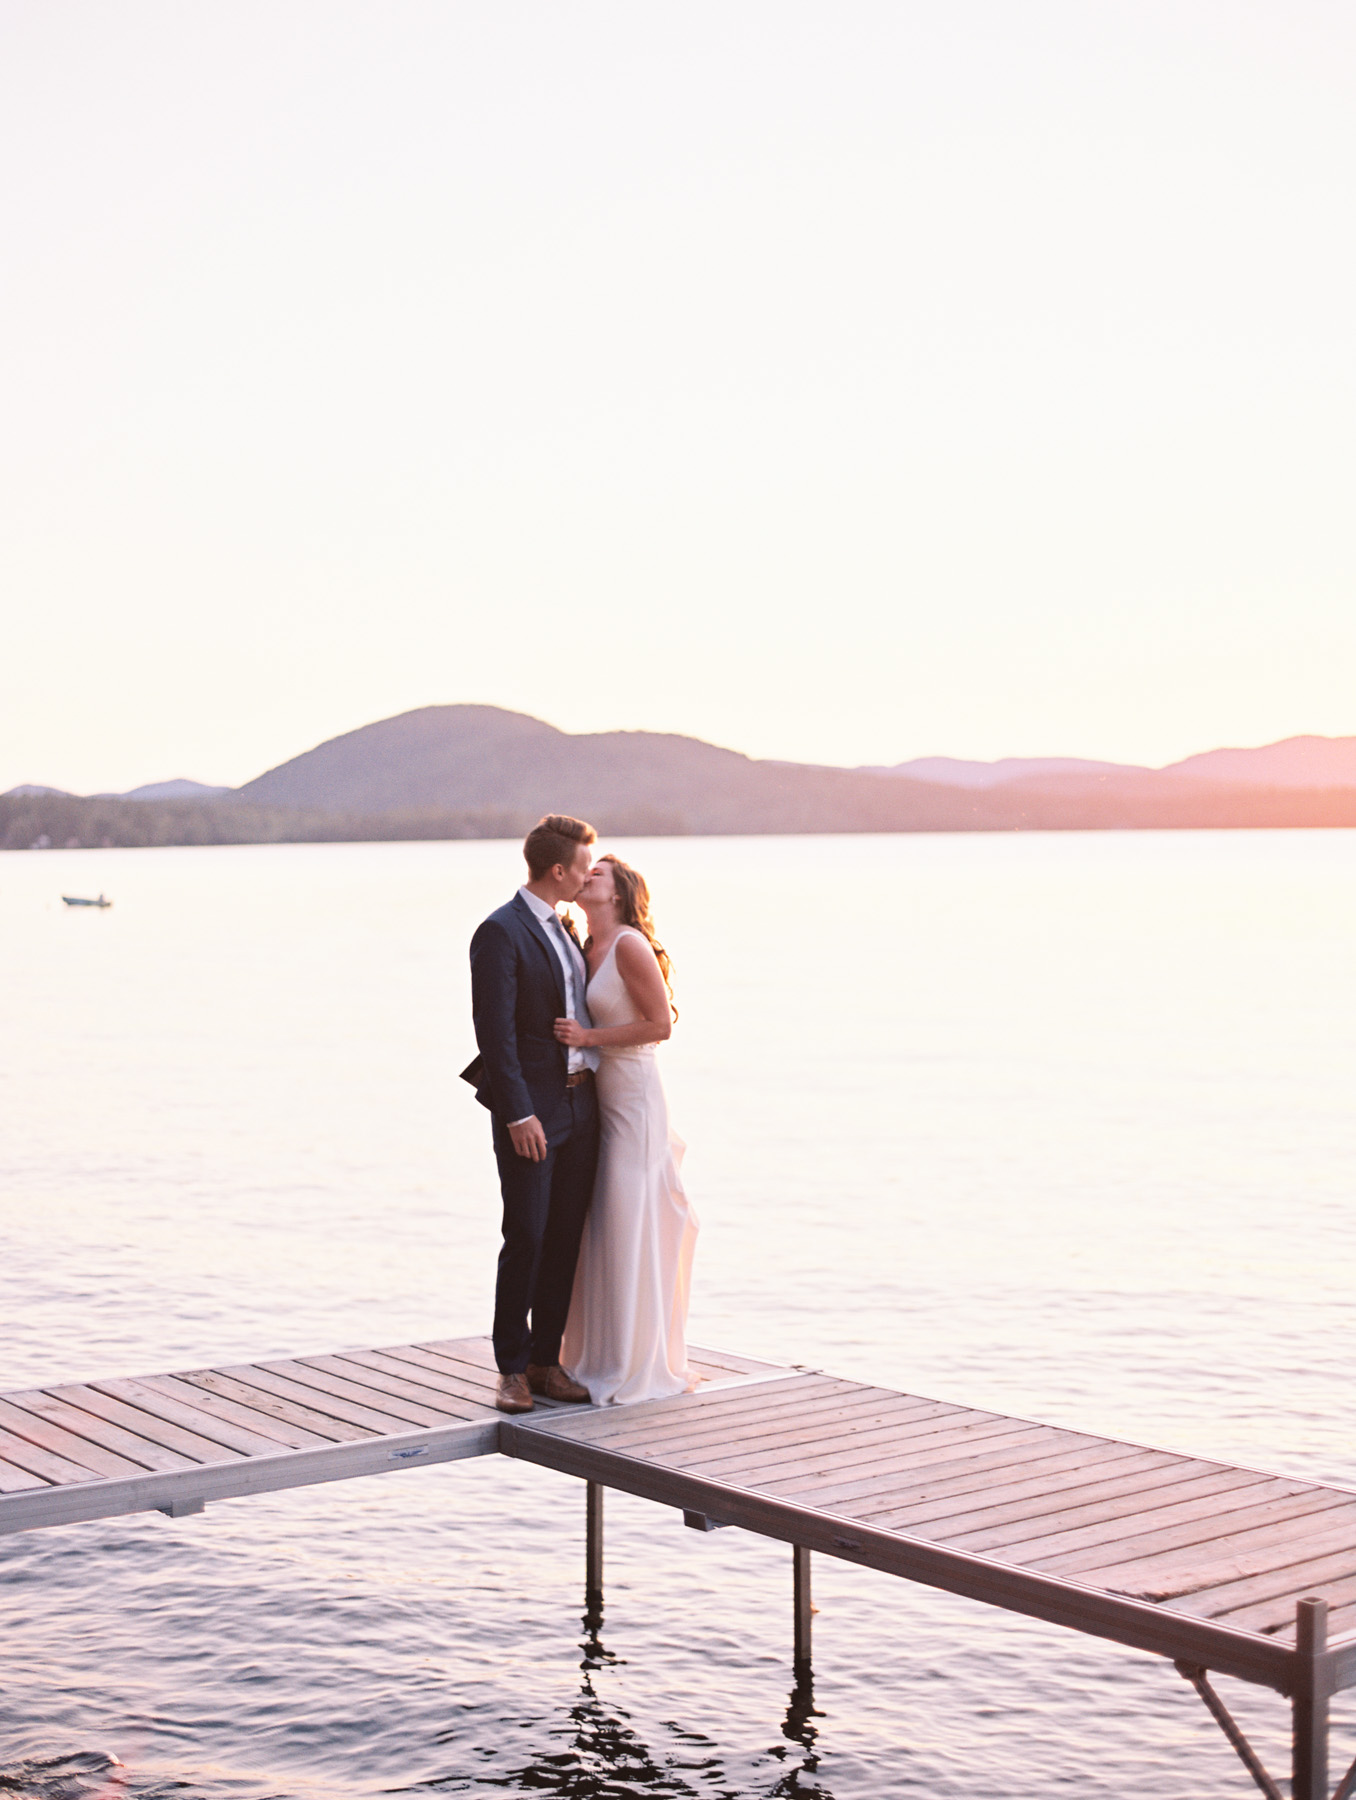 Wedding-Photography-Campground-27.jpg